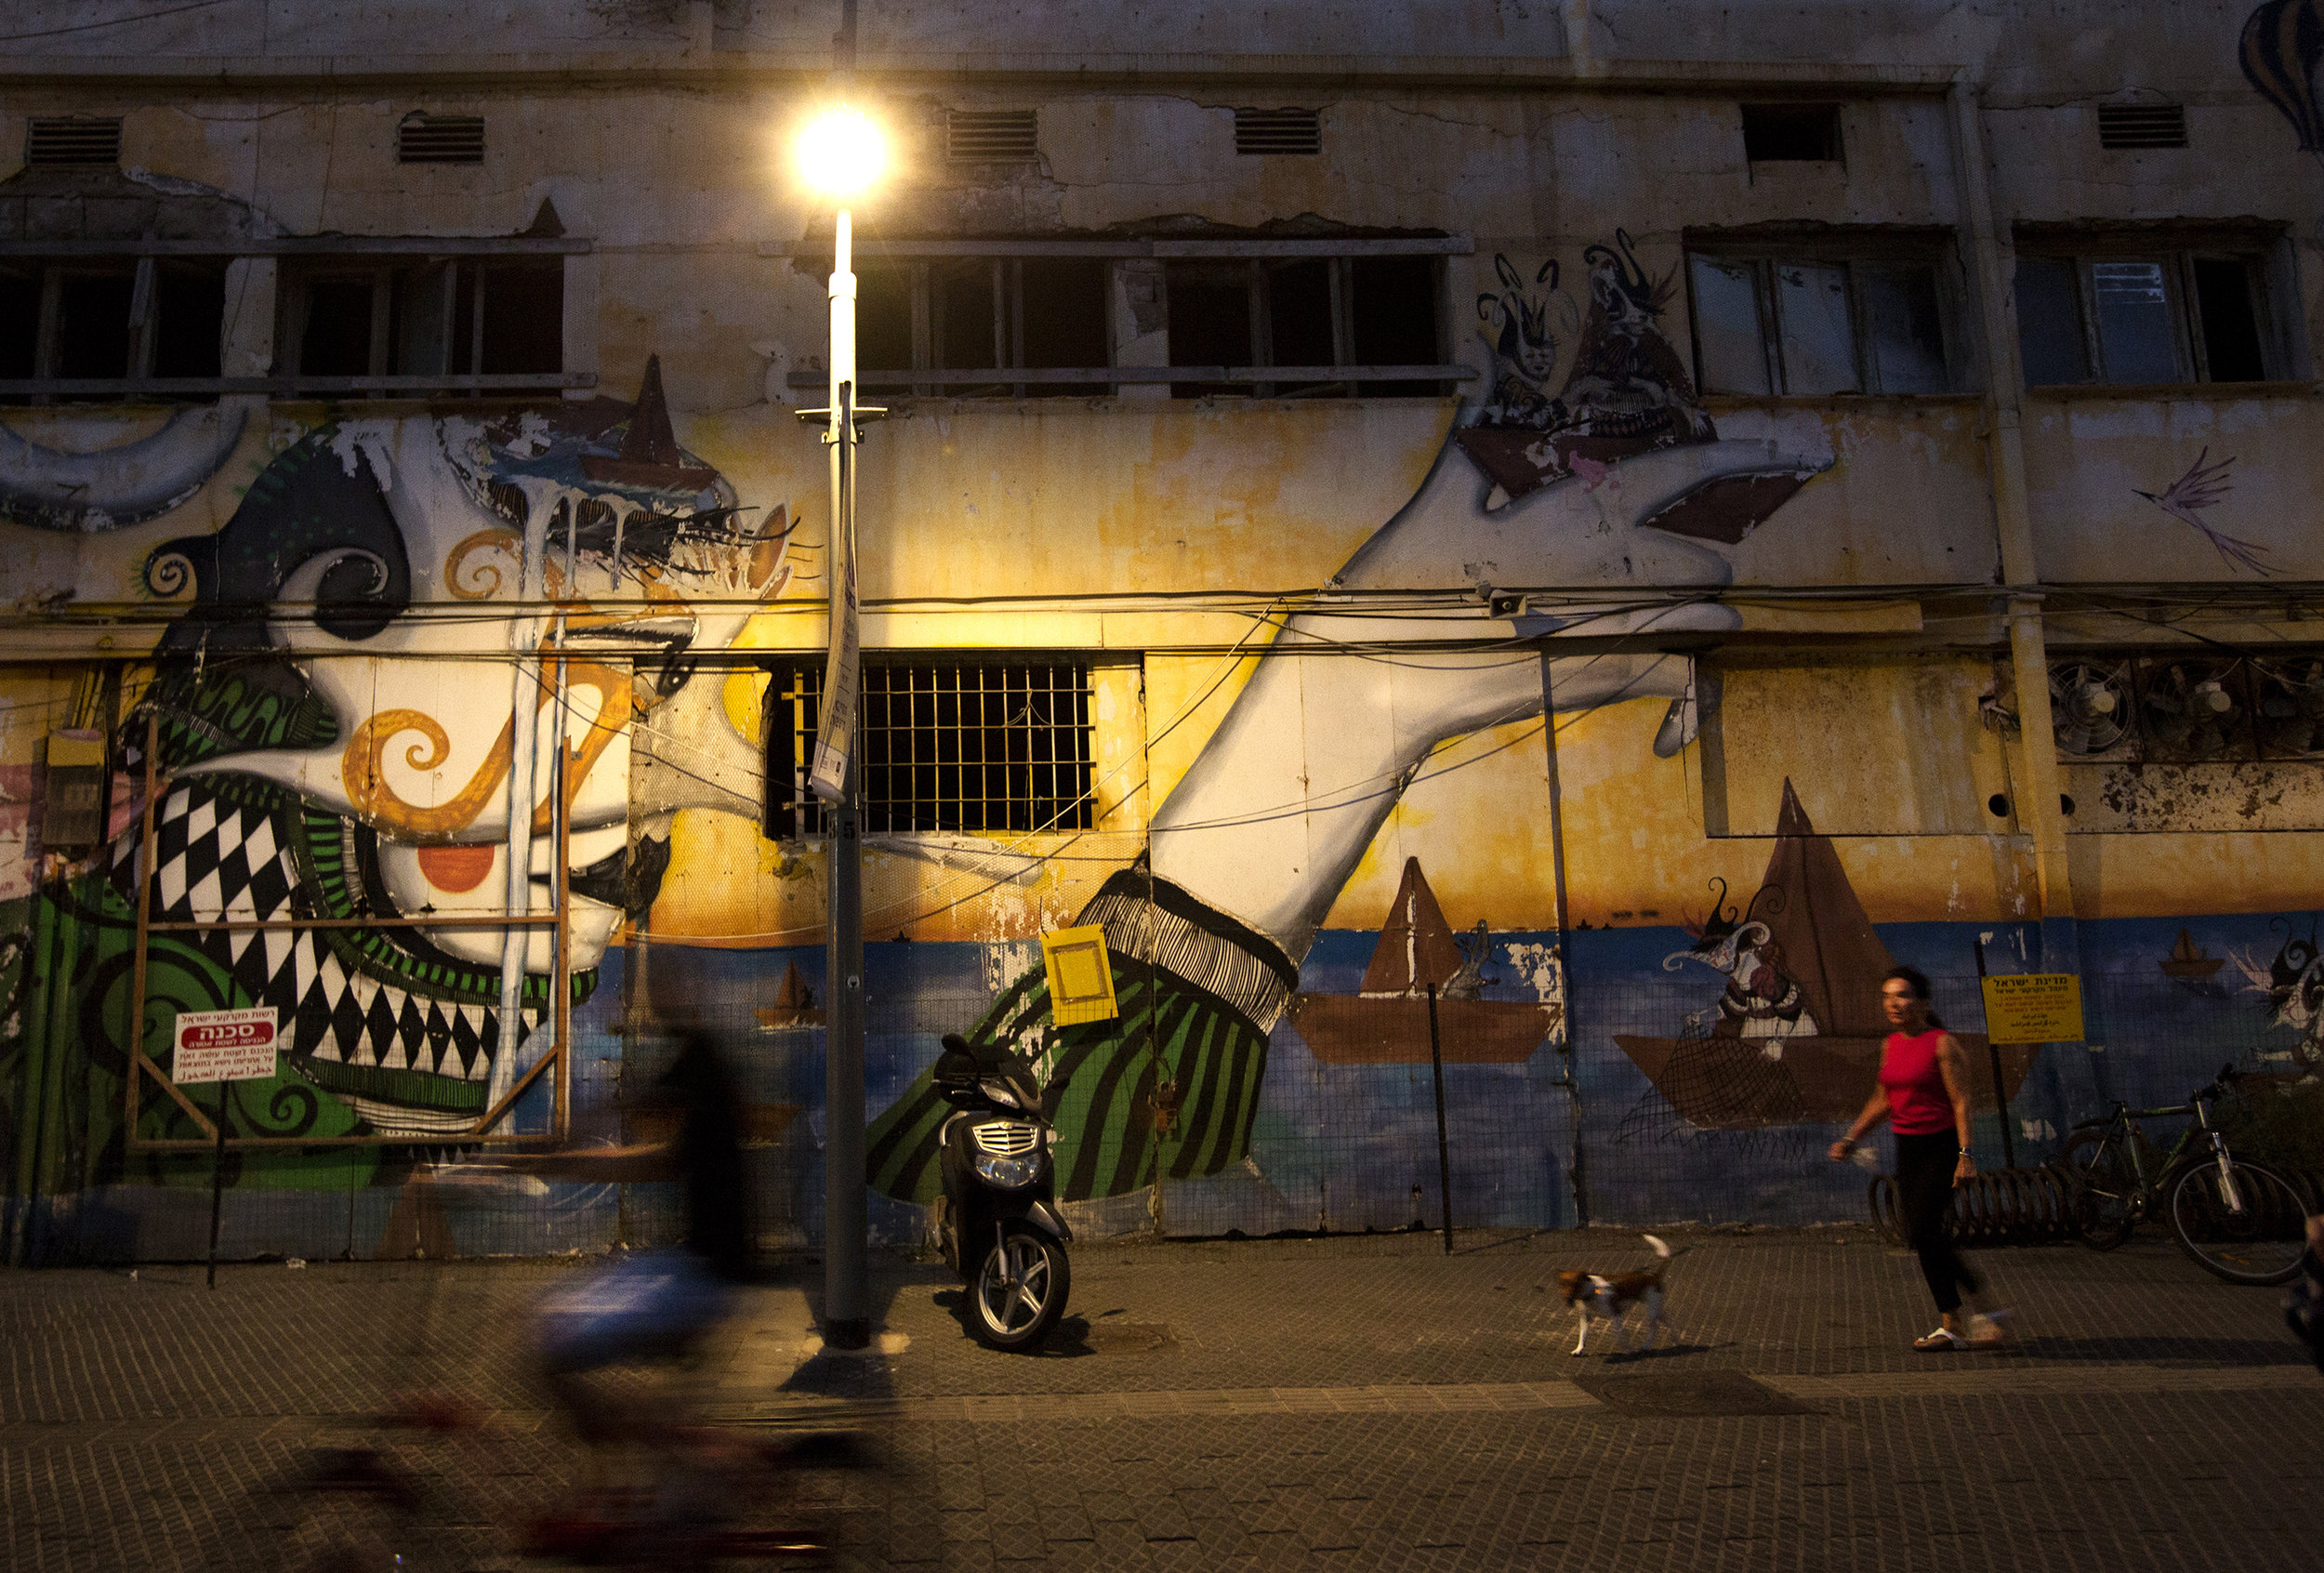 Jaffa, Israel, ©Beatriz Terrazas 2016